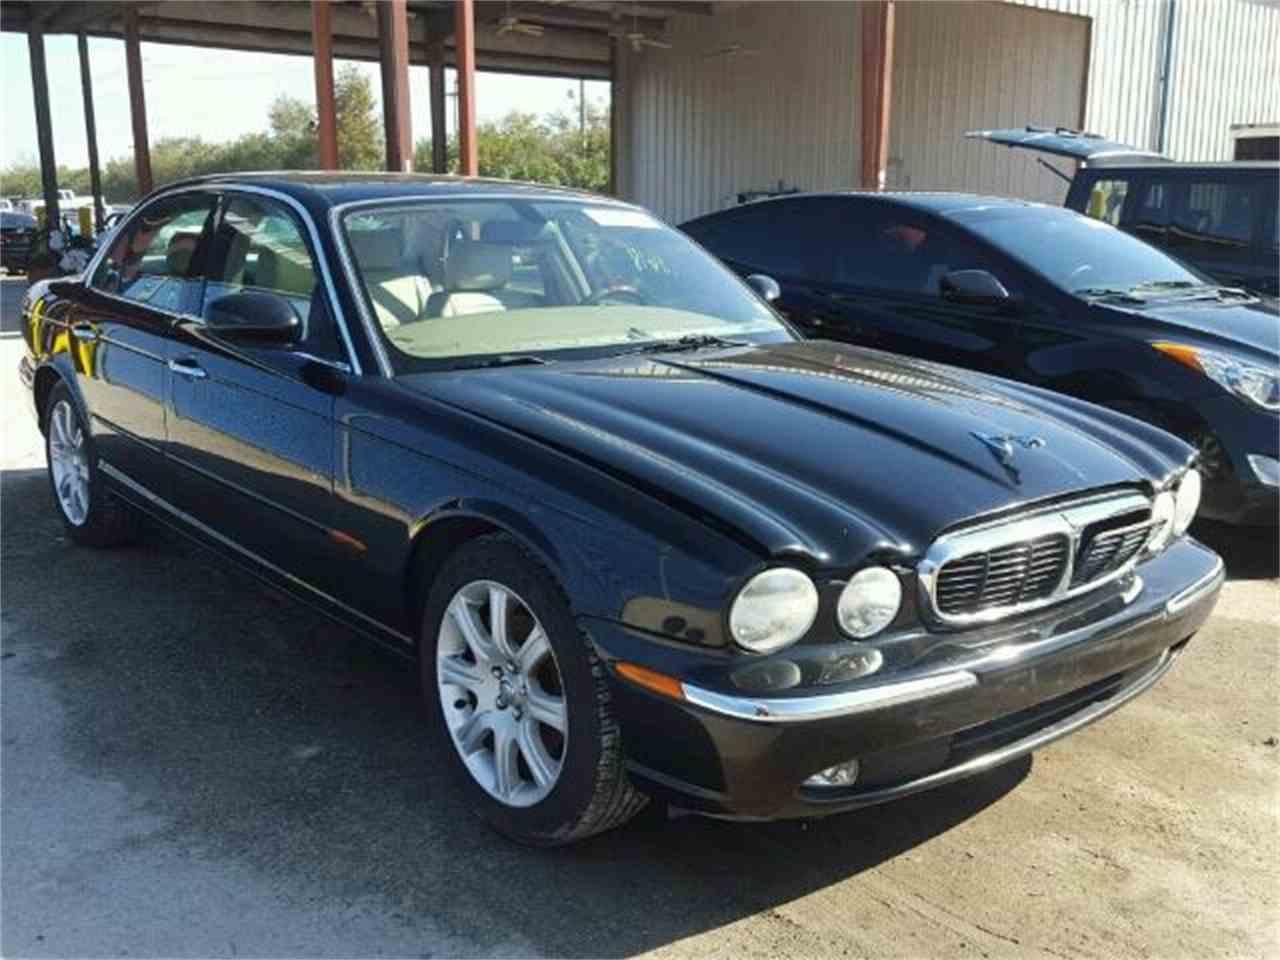 washington com c large cc of sale jaguar tacoma view listings classiccars for picture std in